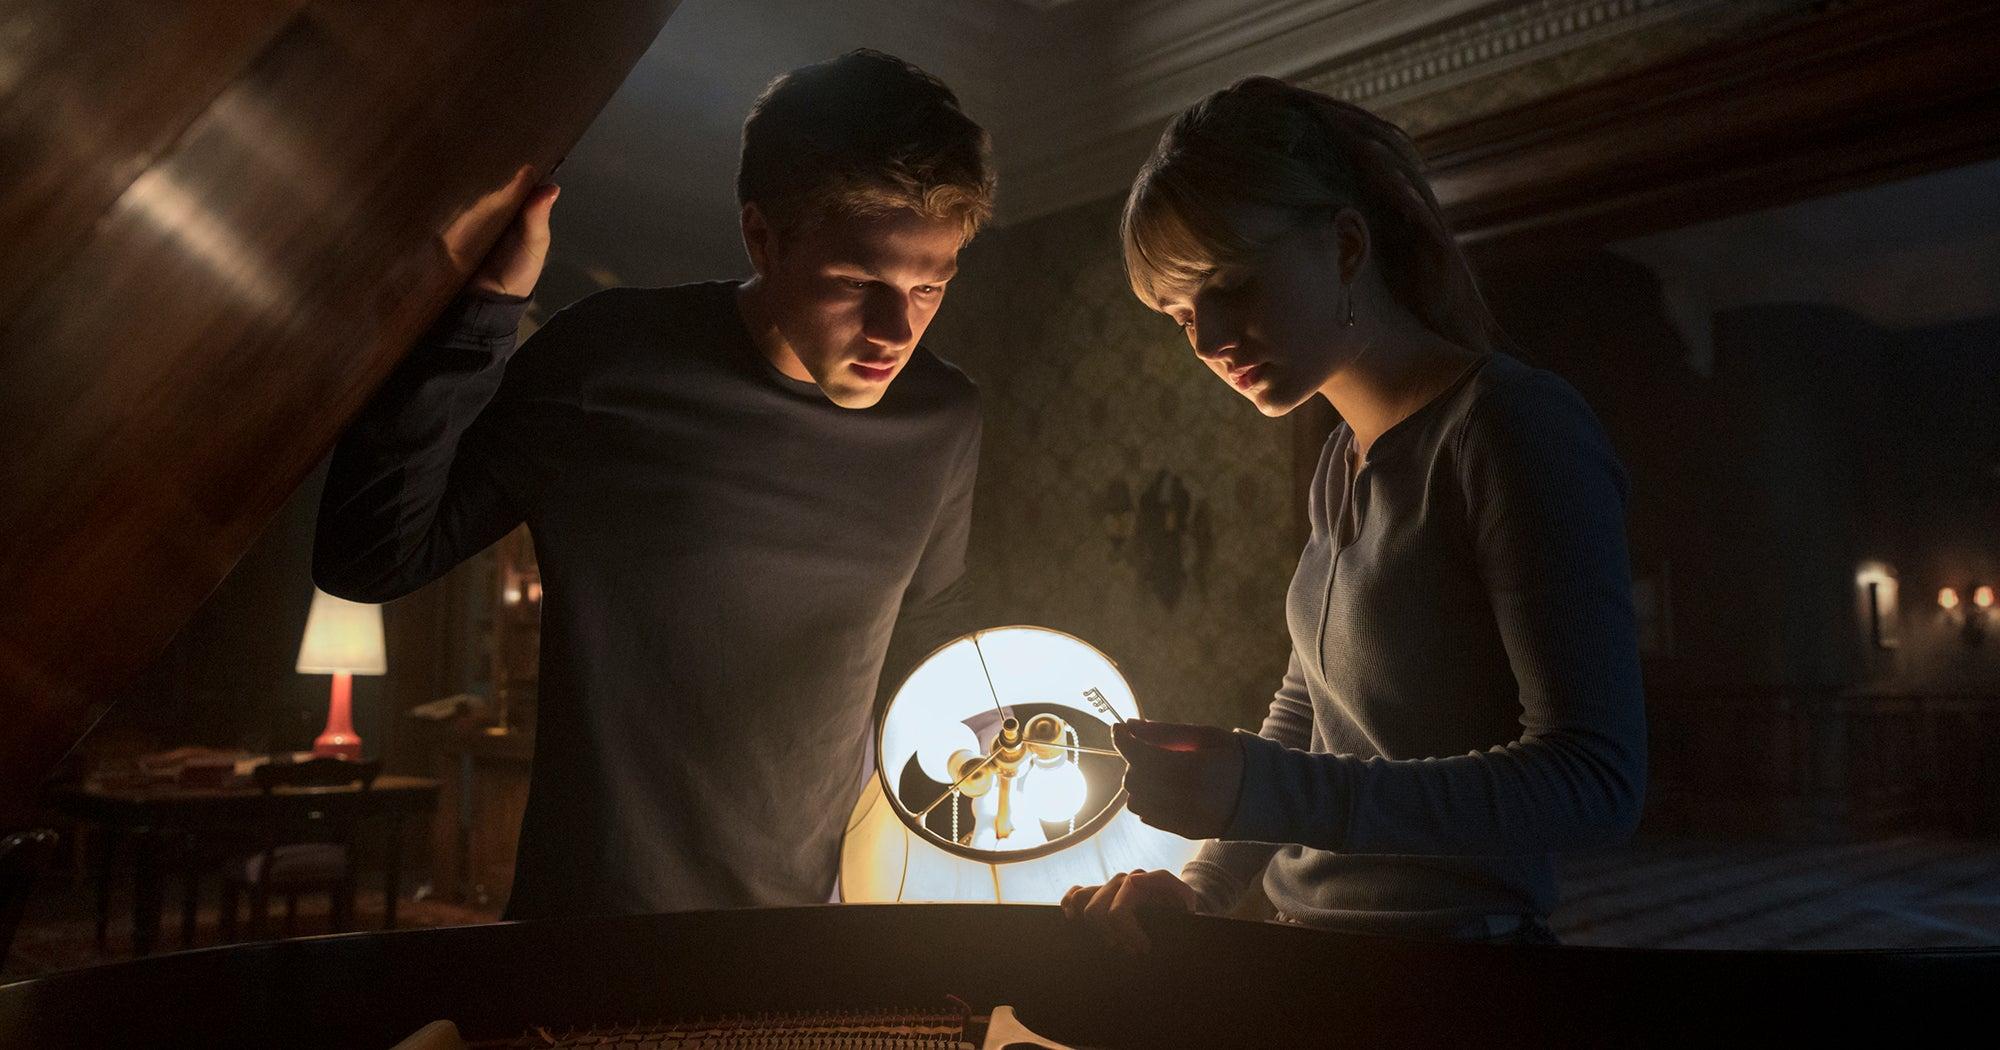 'Locke Key' Has Plenty Of Season 2 Source Material